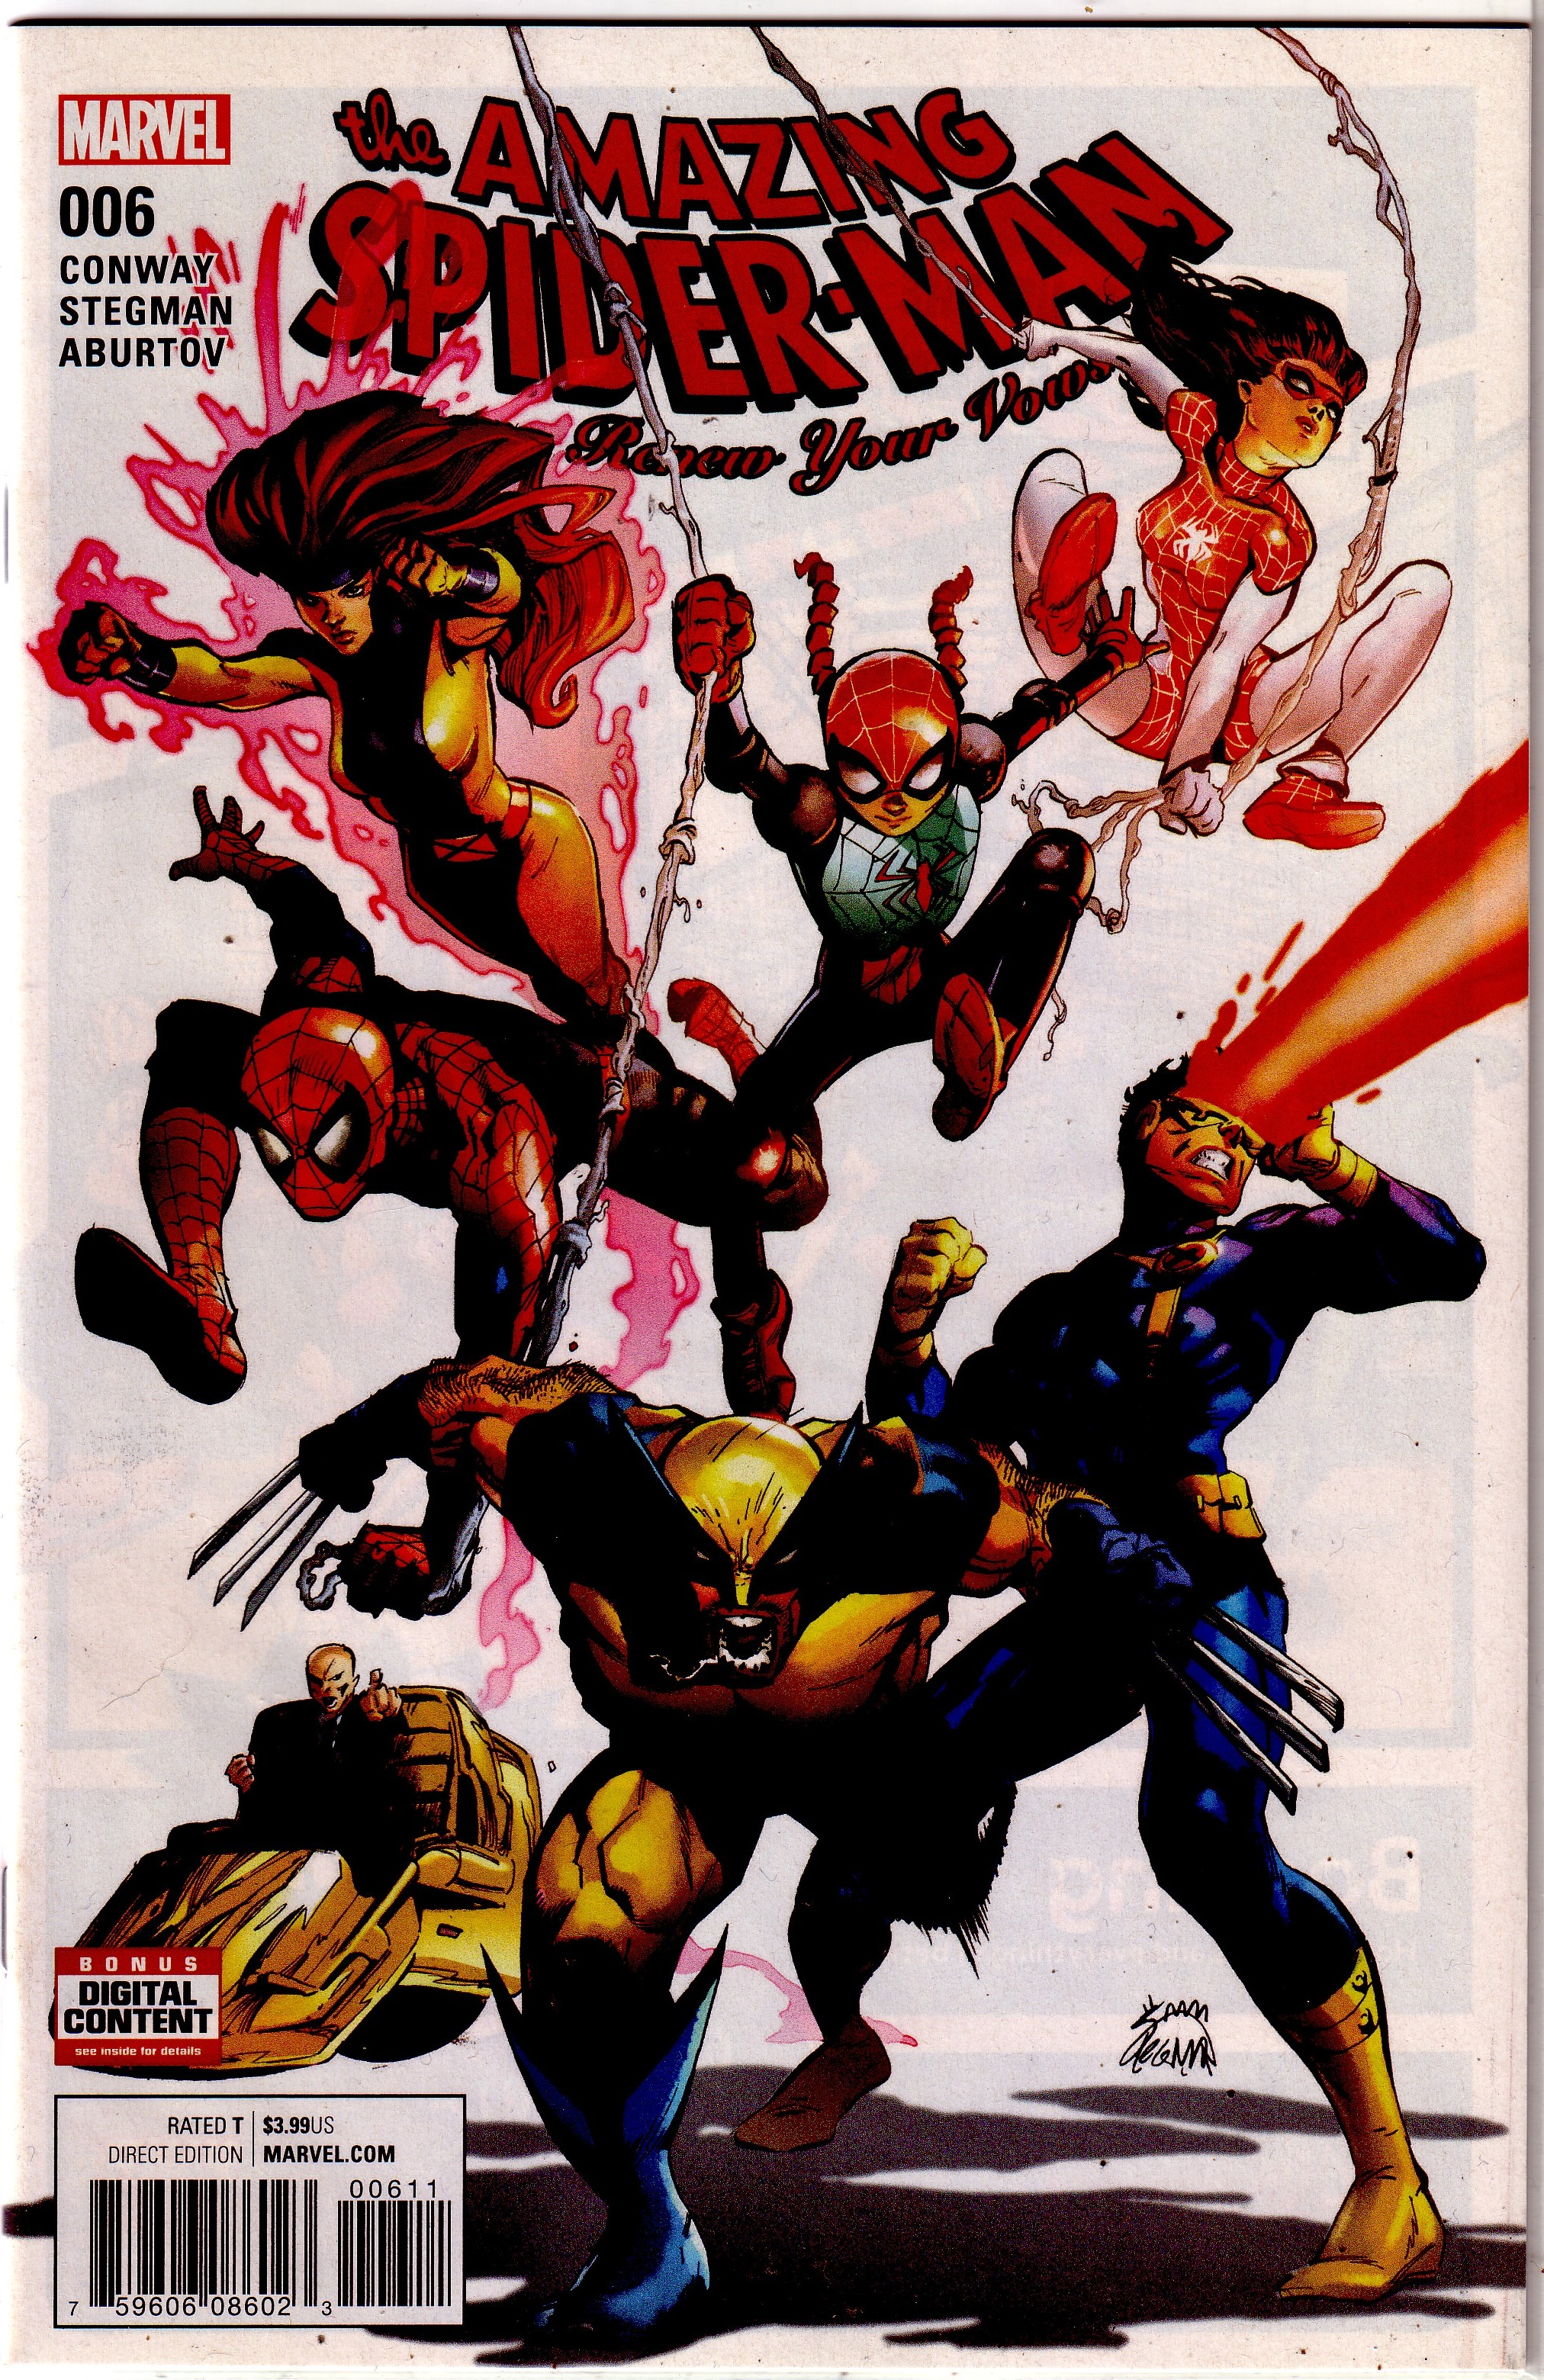 Marvel, 1993 FN Spider-man 2099 #11